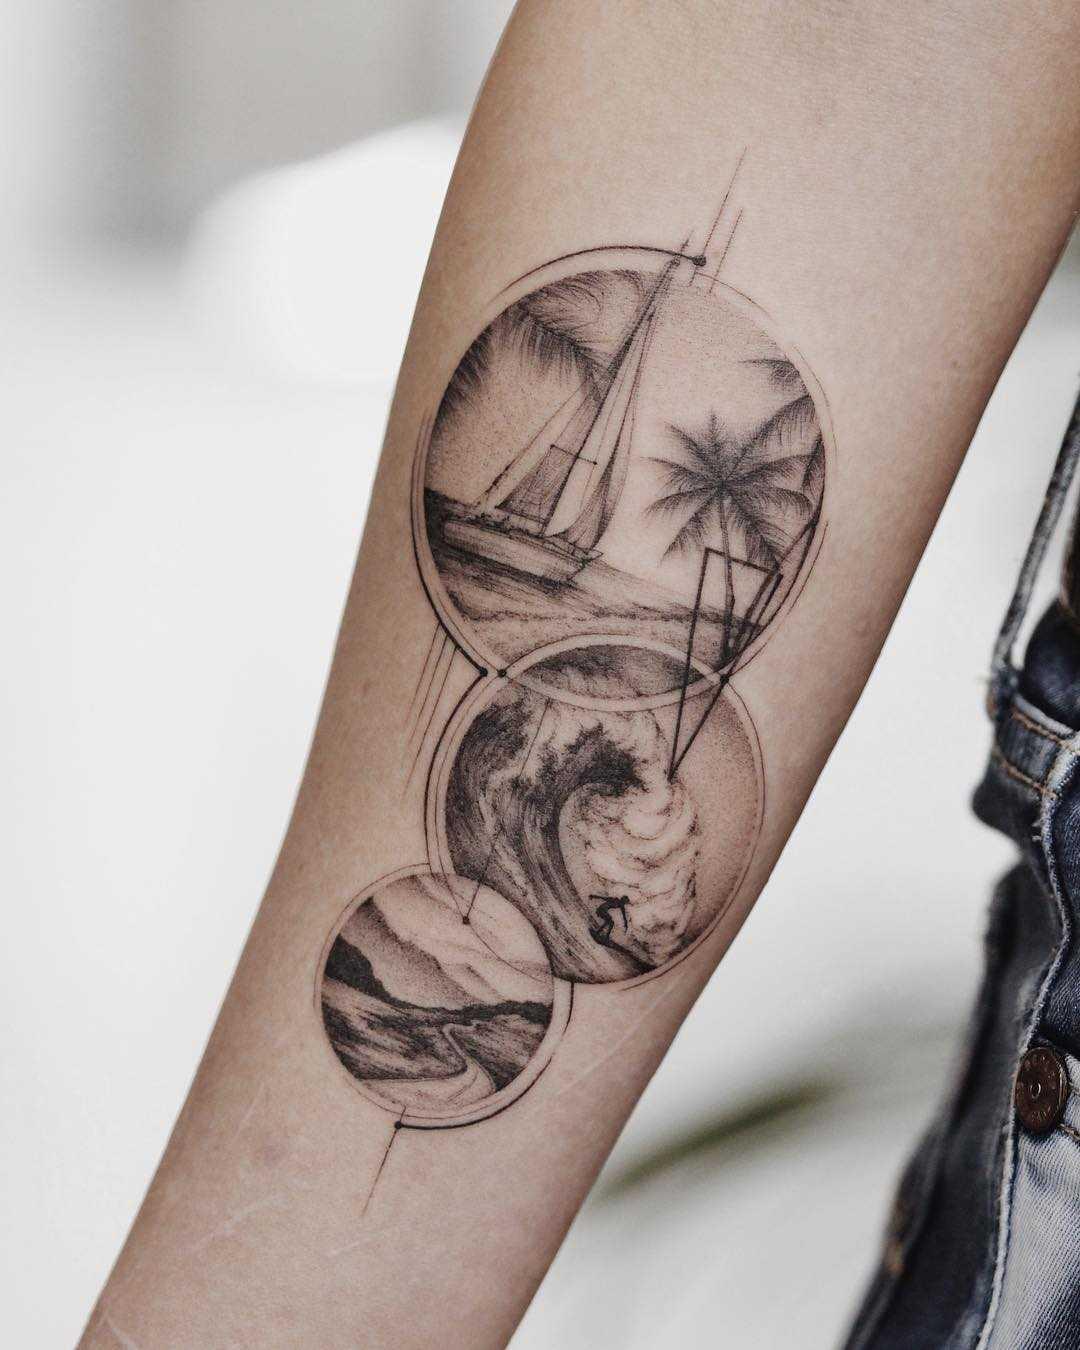 Framed memories tattoo